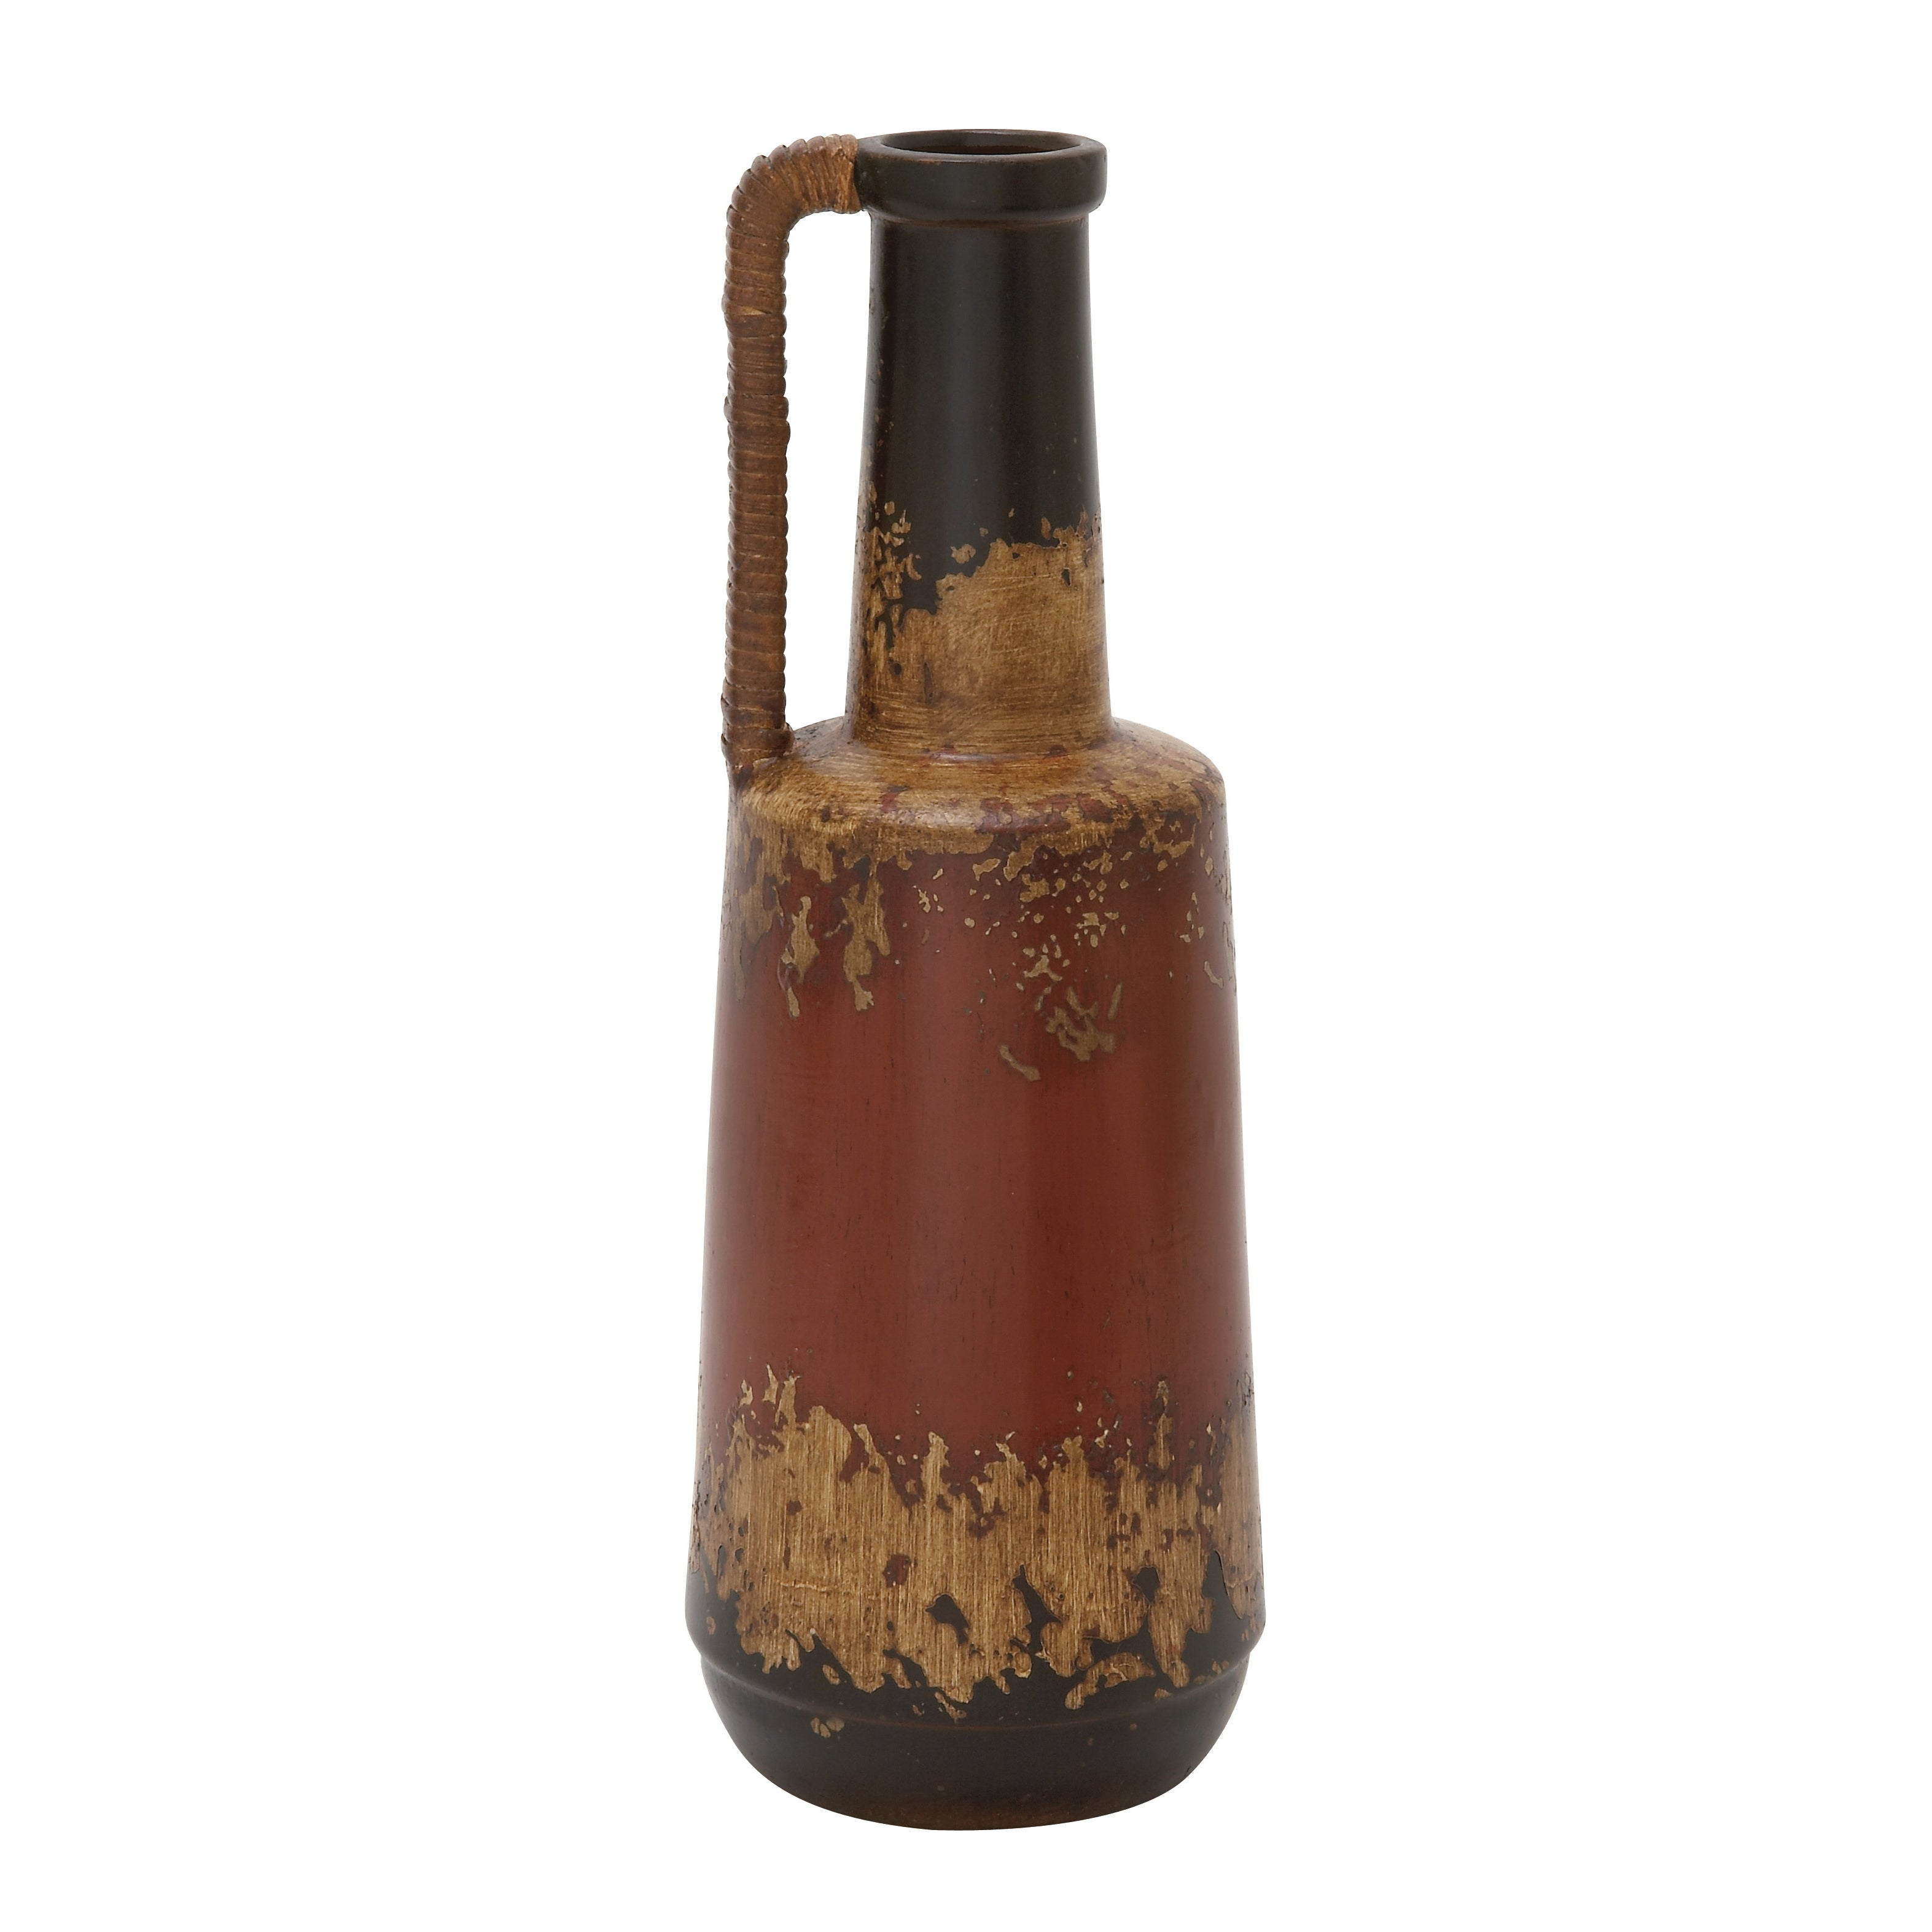 Ceramic Rattan Handle Pot 7-inch x 20-inch